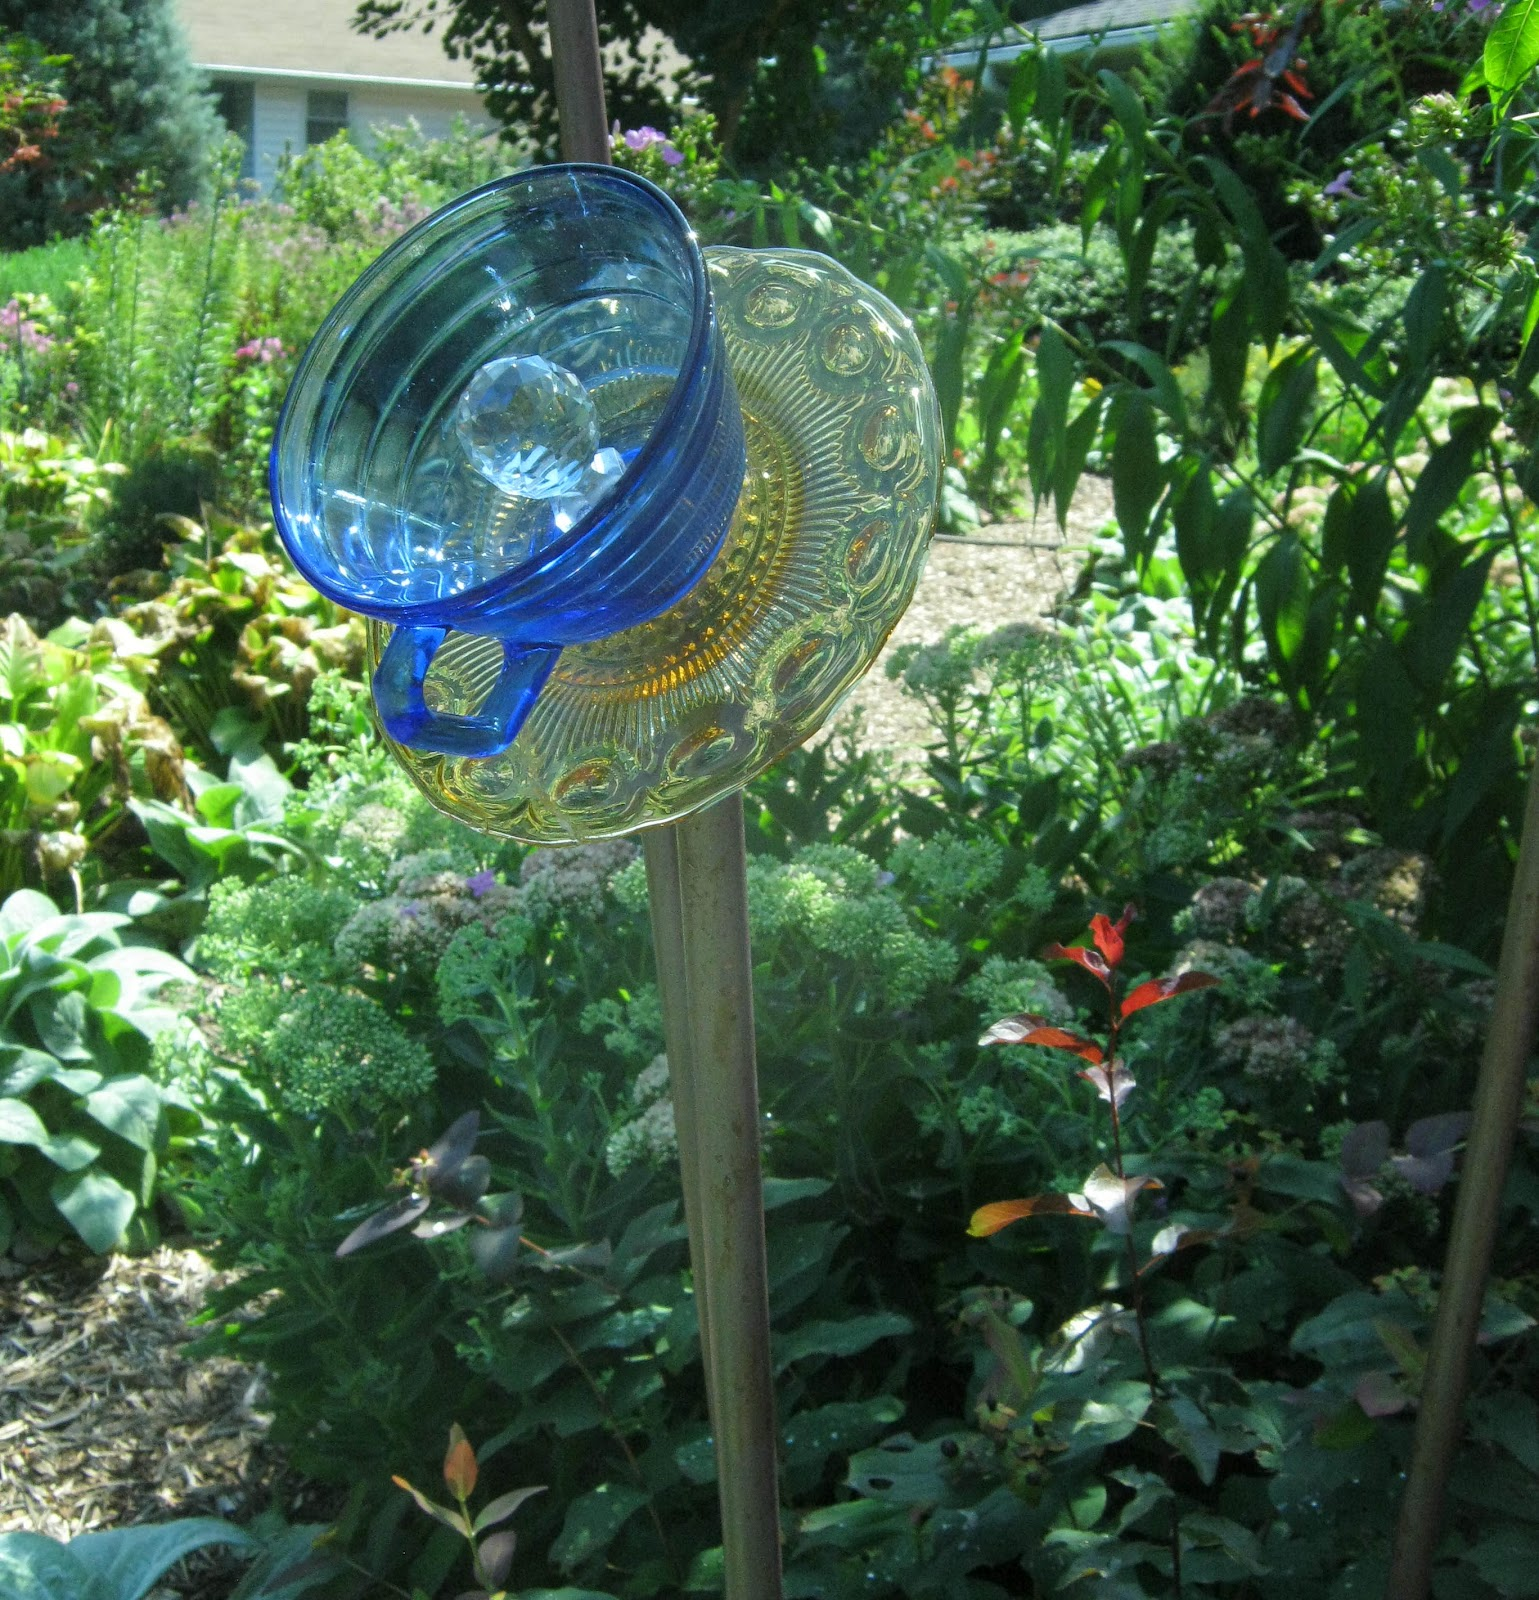 Sorta fabulous garden art make it personal for Garden art to make